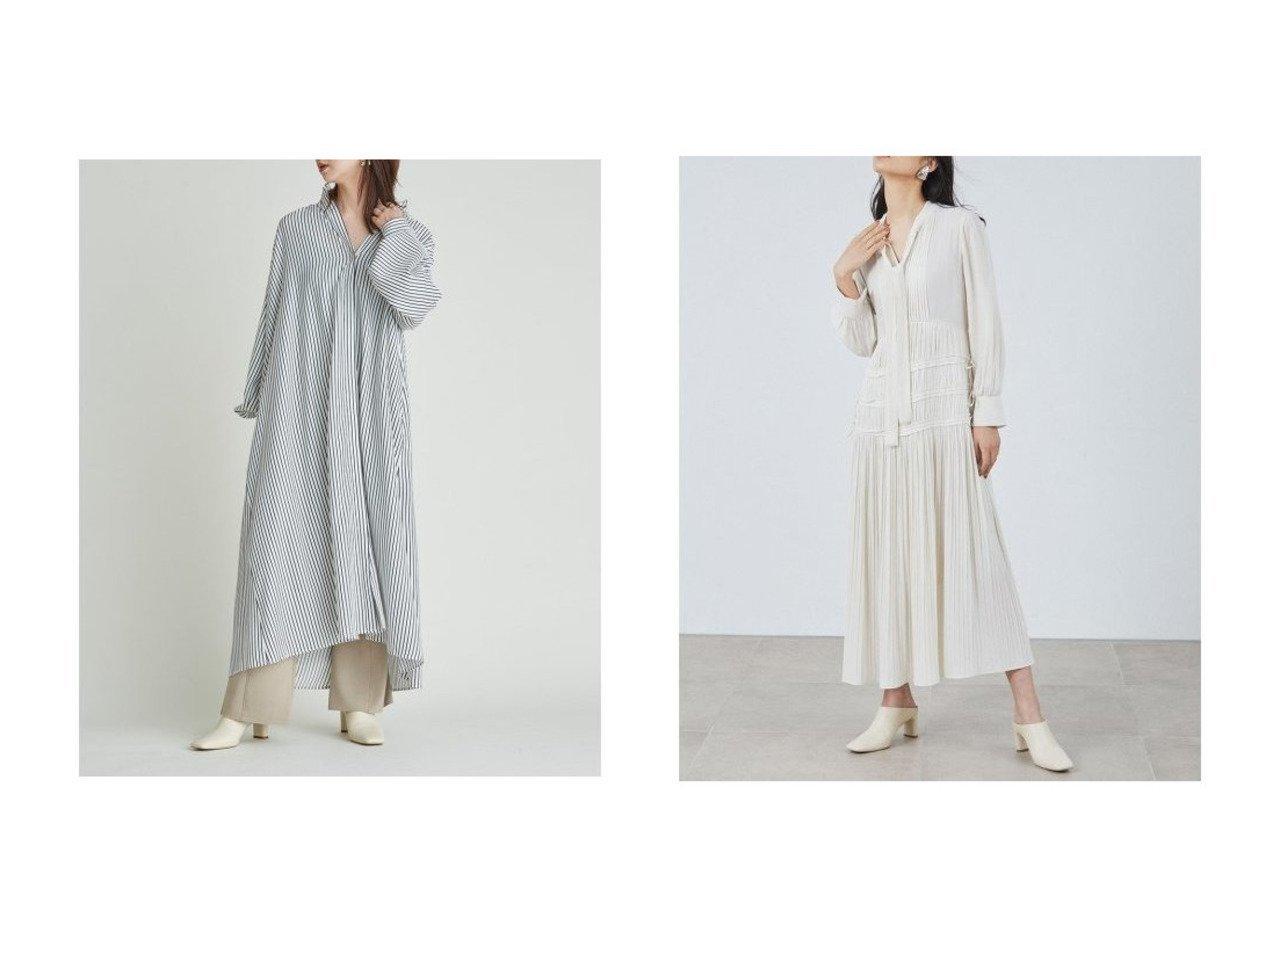 【FRAY I.D/フレイ アイディー】のギャザーロングシャツワンピース&2wayジョーゼットプリーツワンピース ワンピース・ドレスのおすすめ!人気、トレンド・レディースファッションの通販 おすすめで人気の流行・トレンド、ファッションの通販商品 メンズファッション・キッズファッション・インテリア・家具・レディースファッション・服の通販 founy(ファニー) https://founy.com/ ファッション Fashion レディースファッション WOMEN ワンピース Dress シャツワンピース Shirt Dresses ジョーゼット スマート ドット フェミニン プリーツ ベスト 無地 リボン ロング 再入荷 Restock/Back in Stock/Re Arrival |ID:crp329100000024608